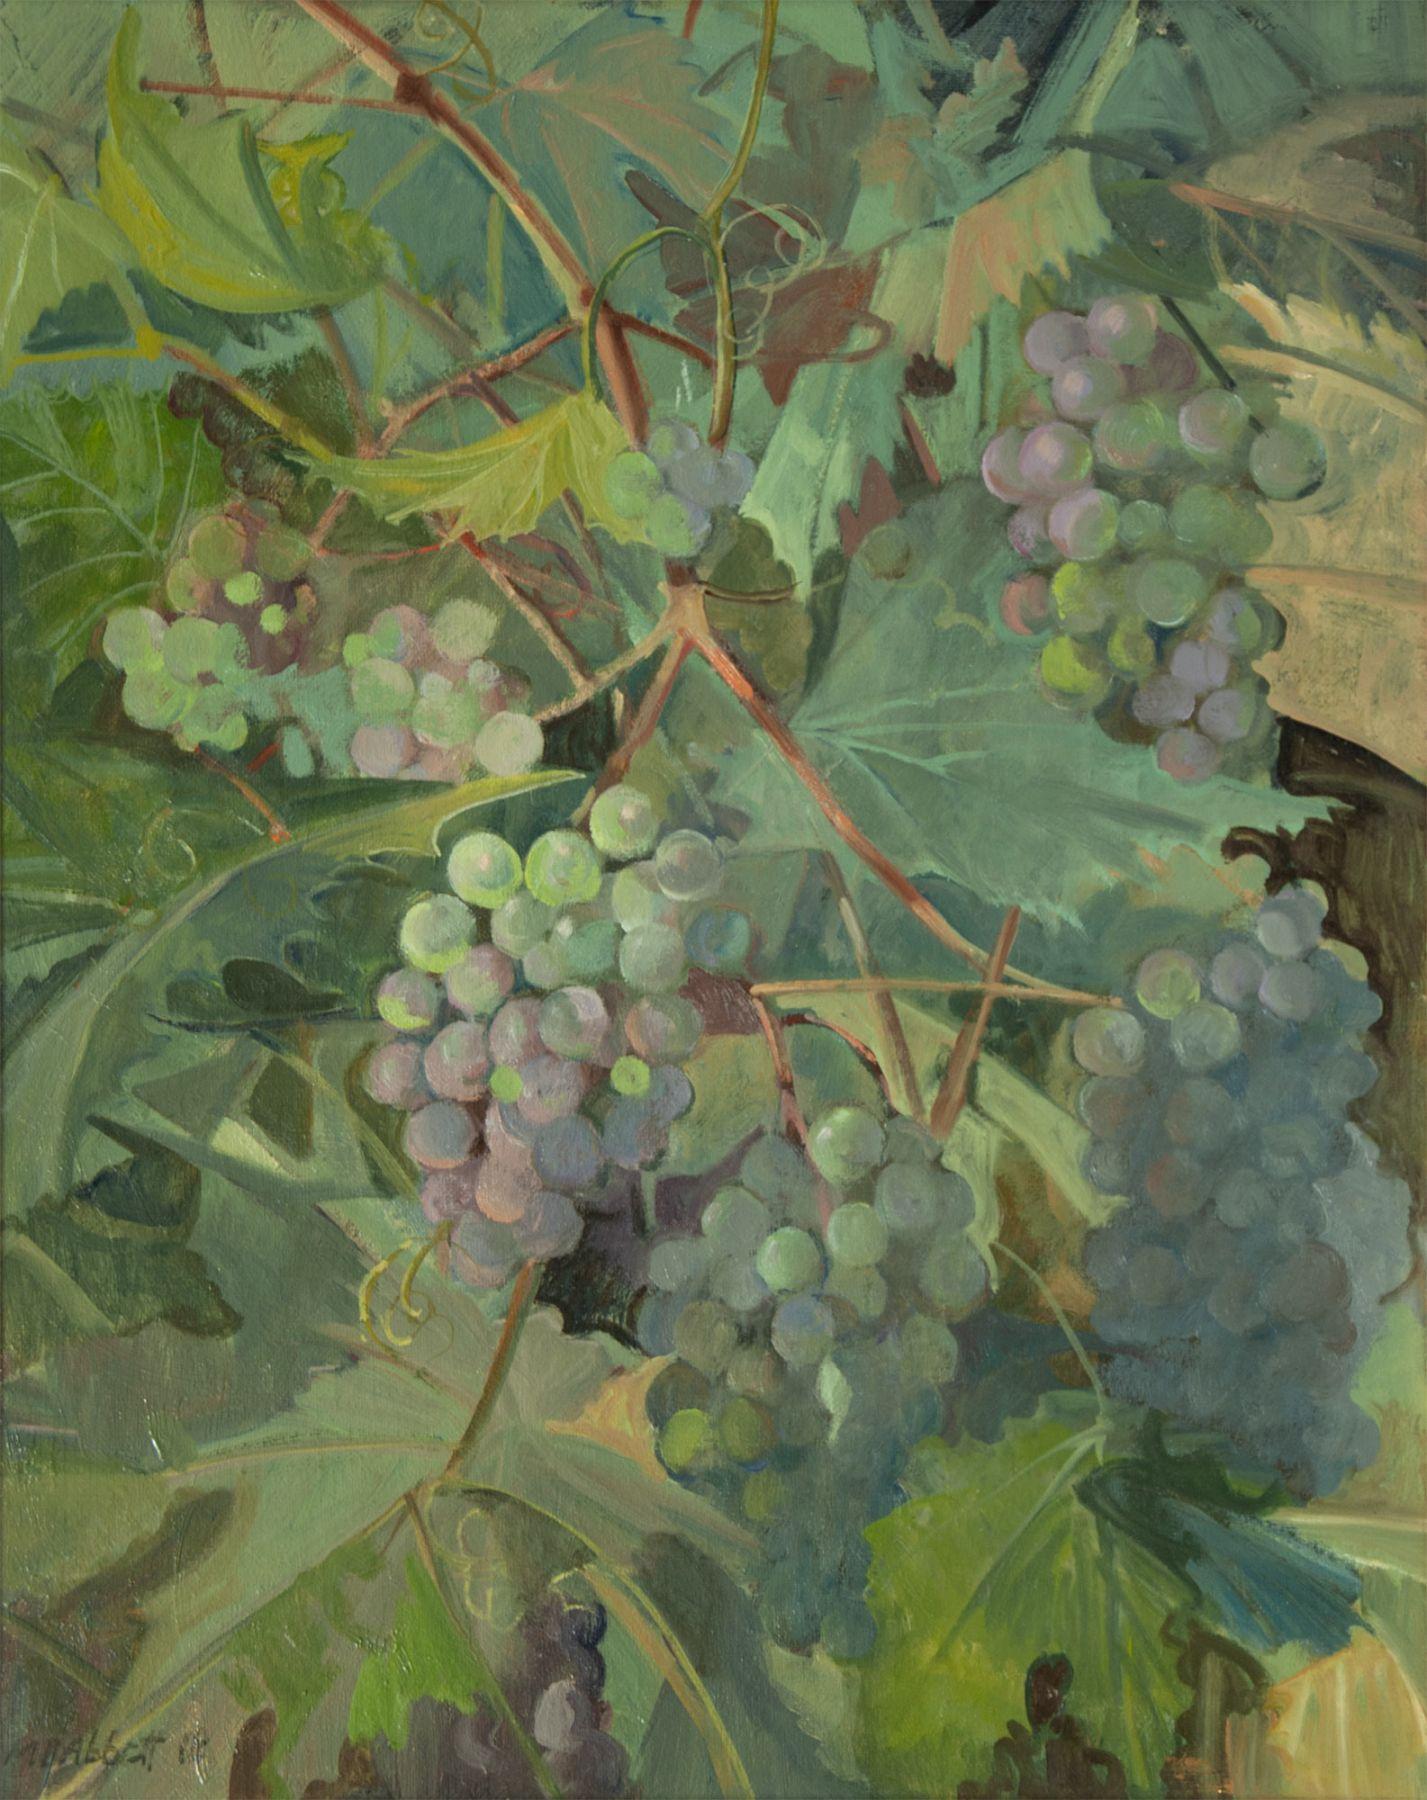 MEREDITH BROOKS ABBOTT, Grapes Turning, 2018